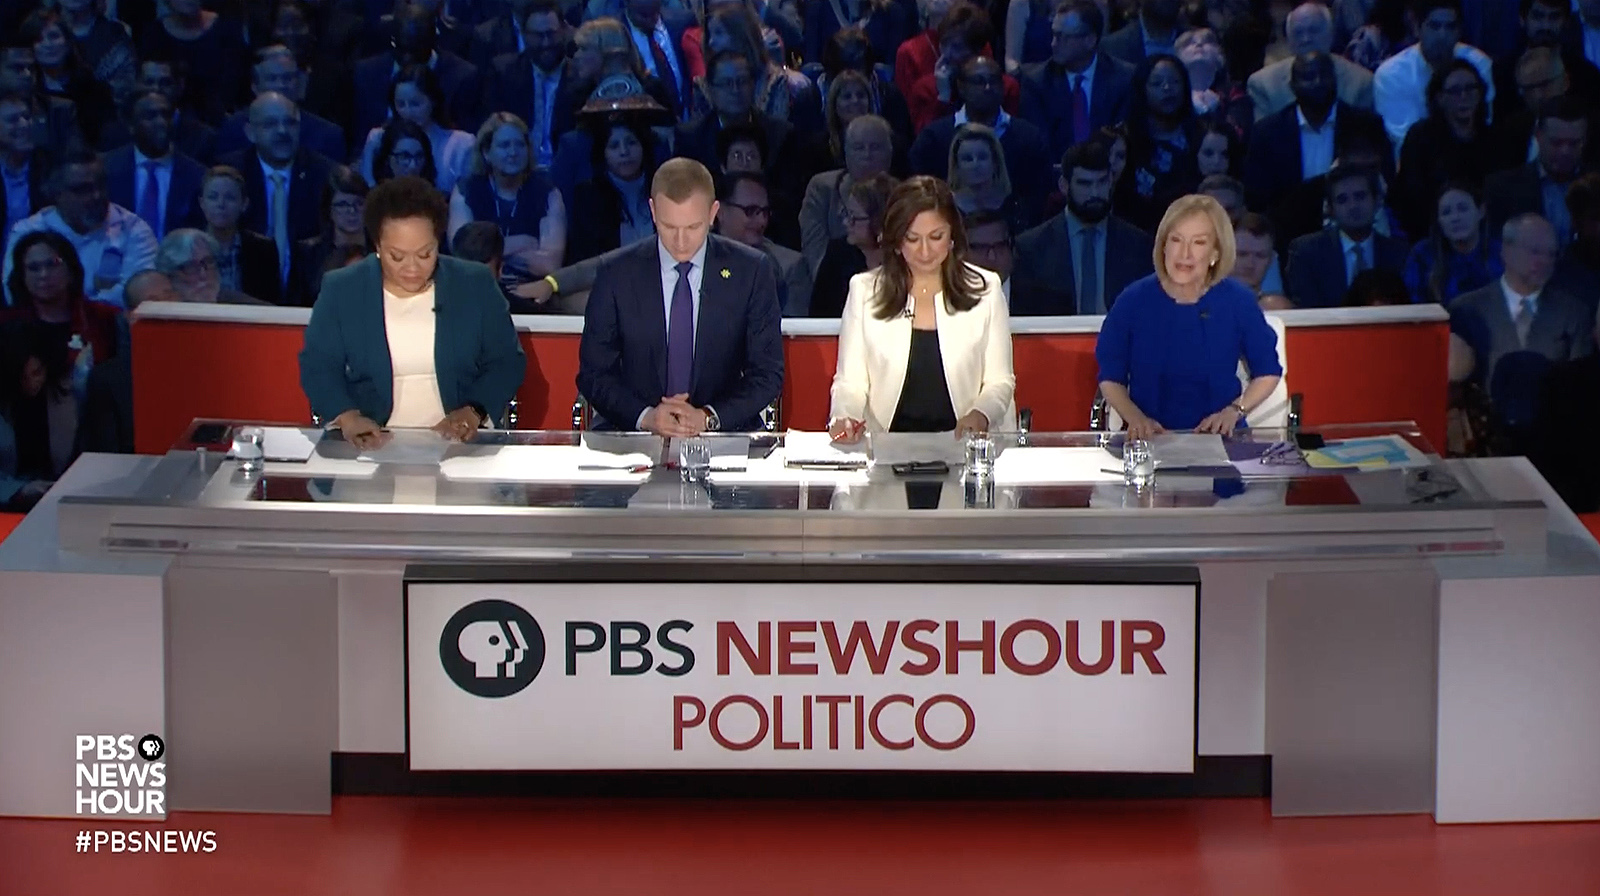 NCS_PBS-NewsHour_Politico_Democratic-Debate_013